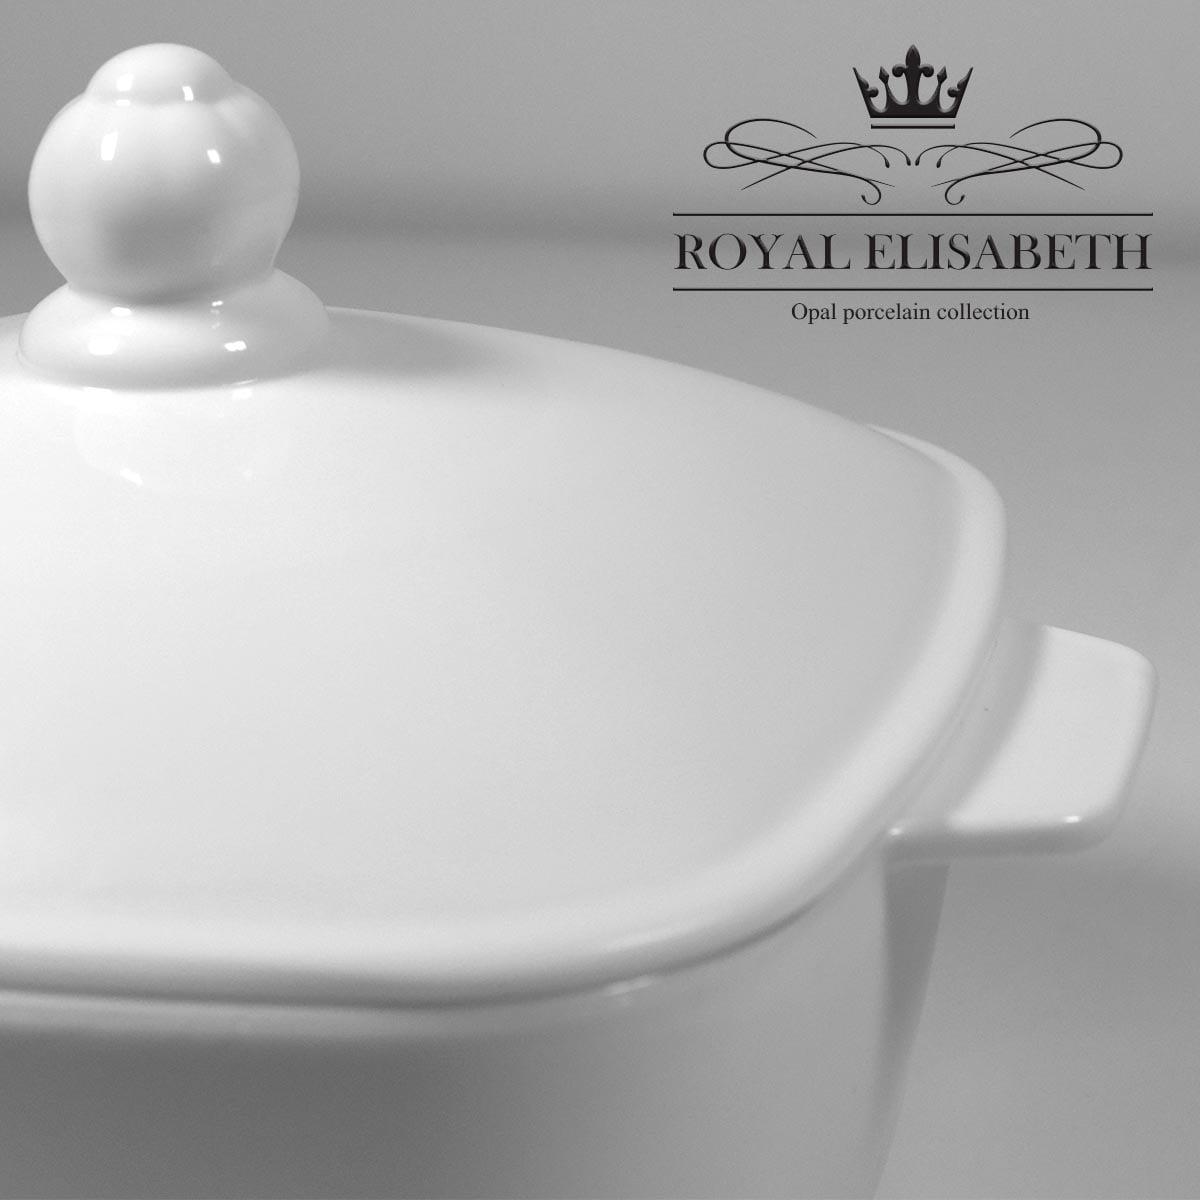 Royal Elisabeth set za ručavanje za 6 osoba od opala - Pearl Collection